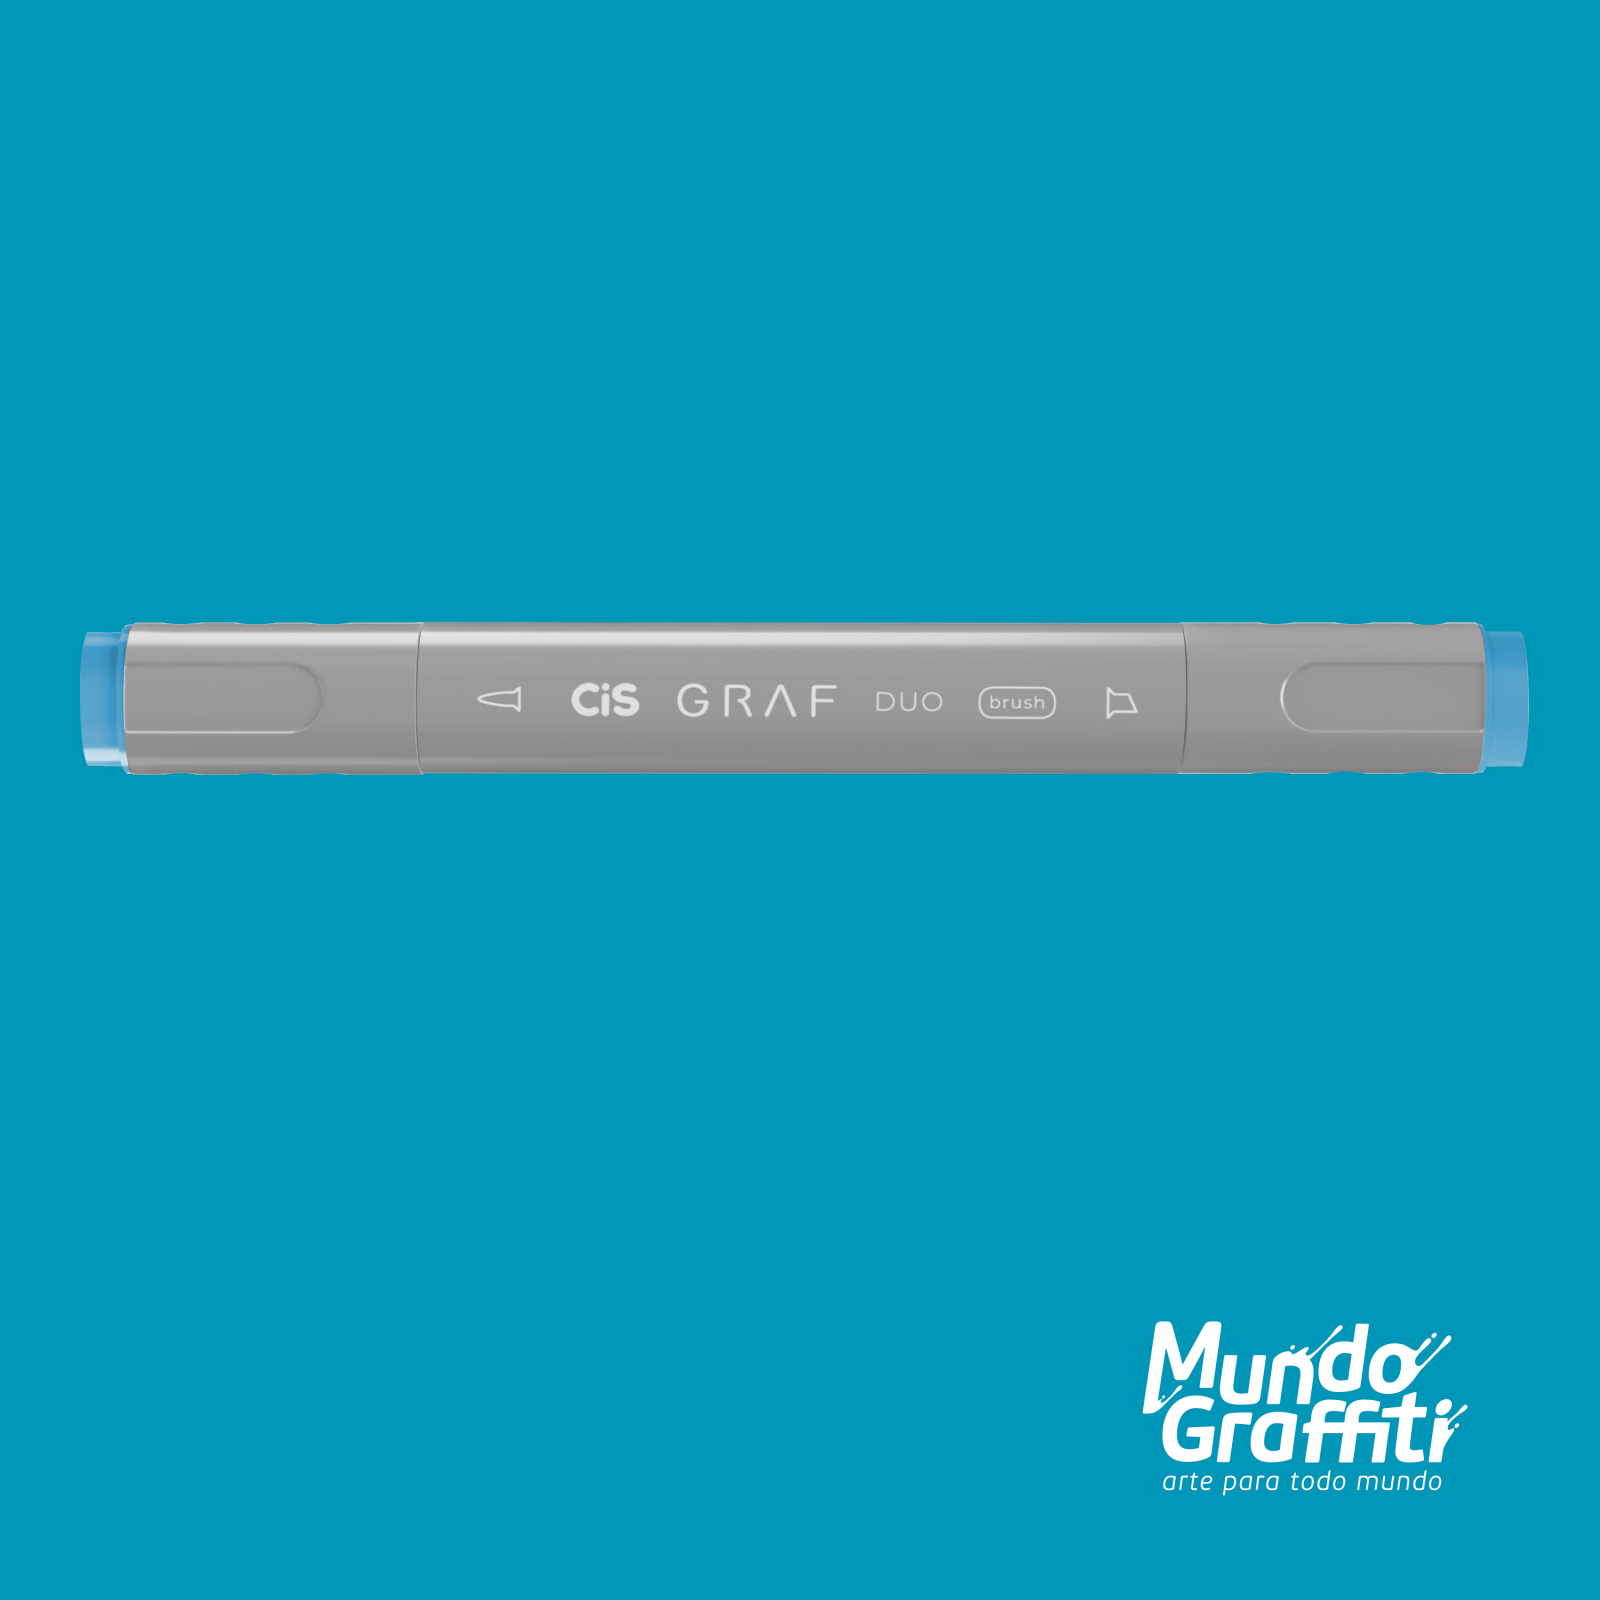 Marcador Cis Graf Duo Brush Indian Blue 64 - Mundo Graffiti